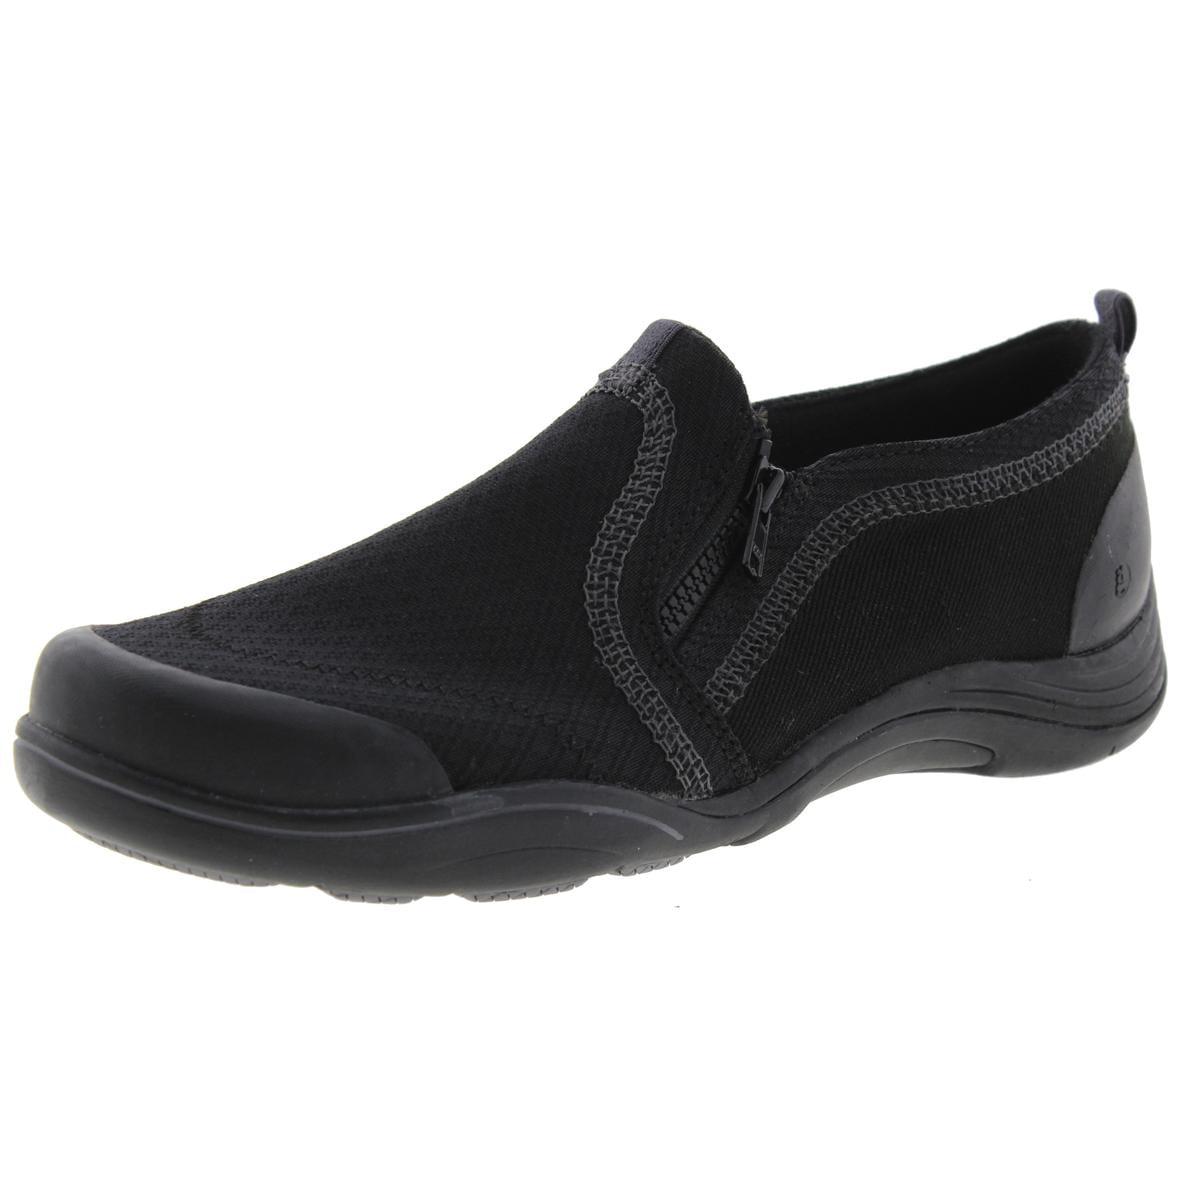 Grasshoppers Womens Elite Zip Mesh Ortholite Walking Shoes